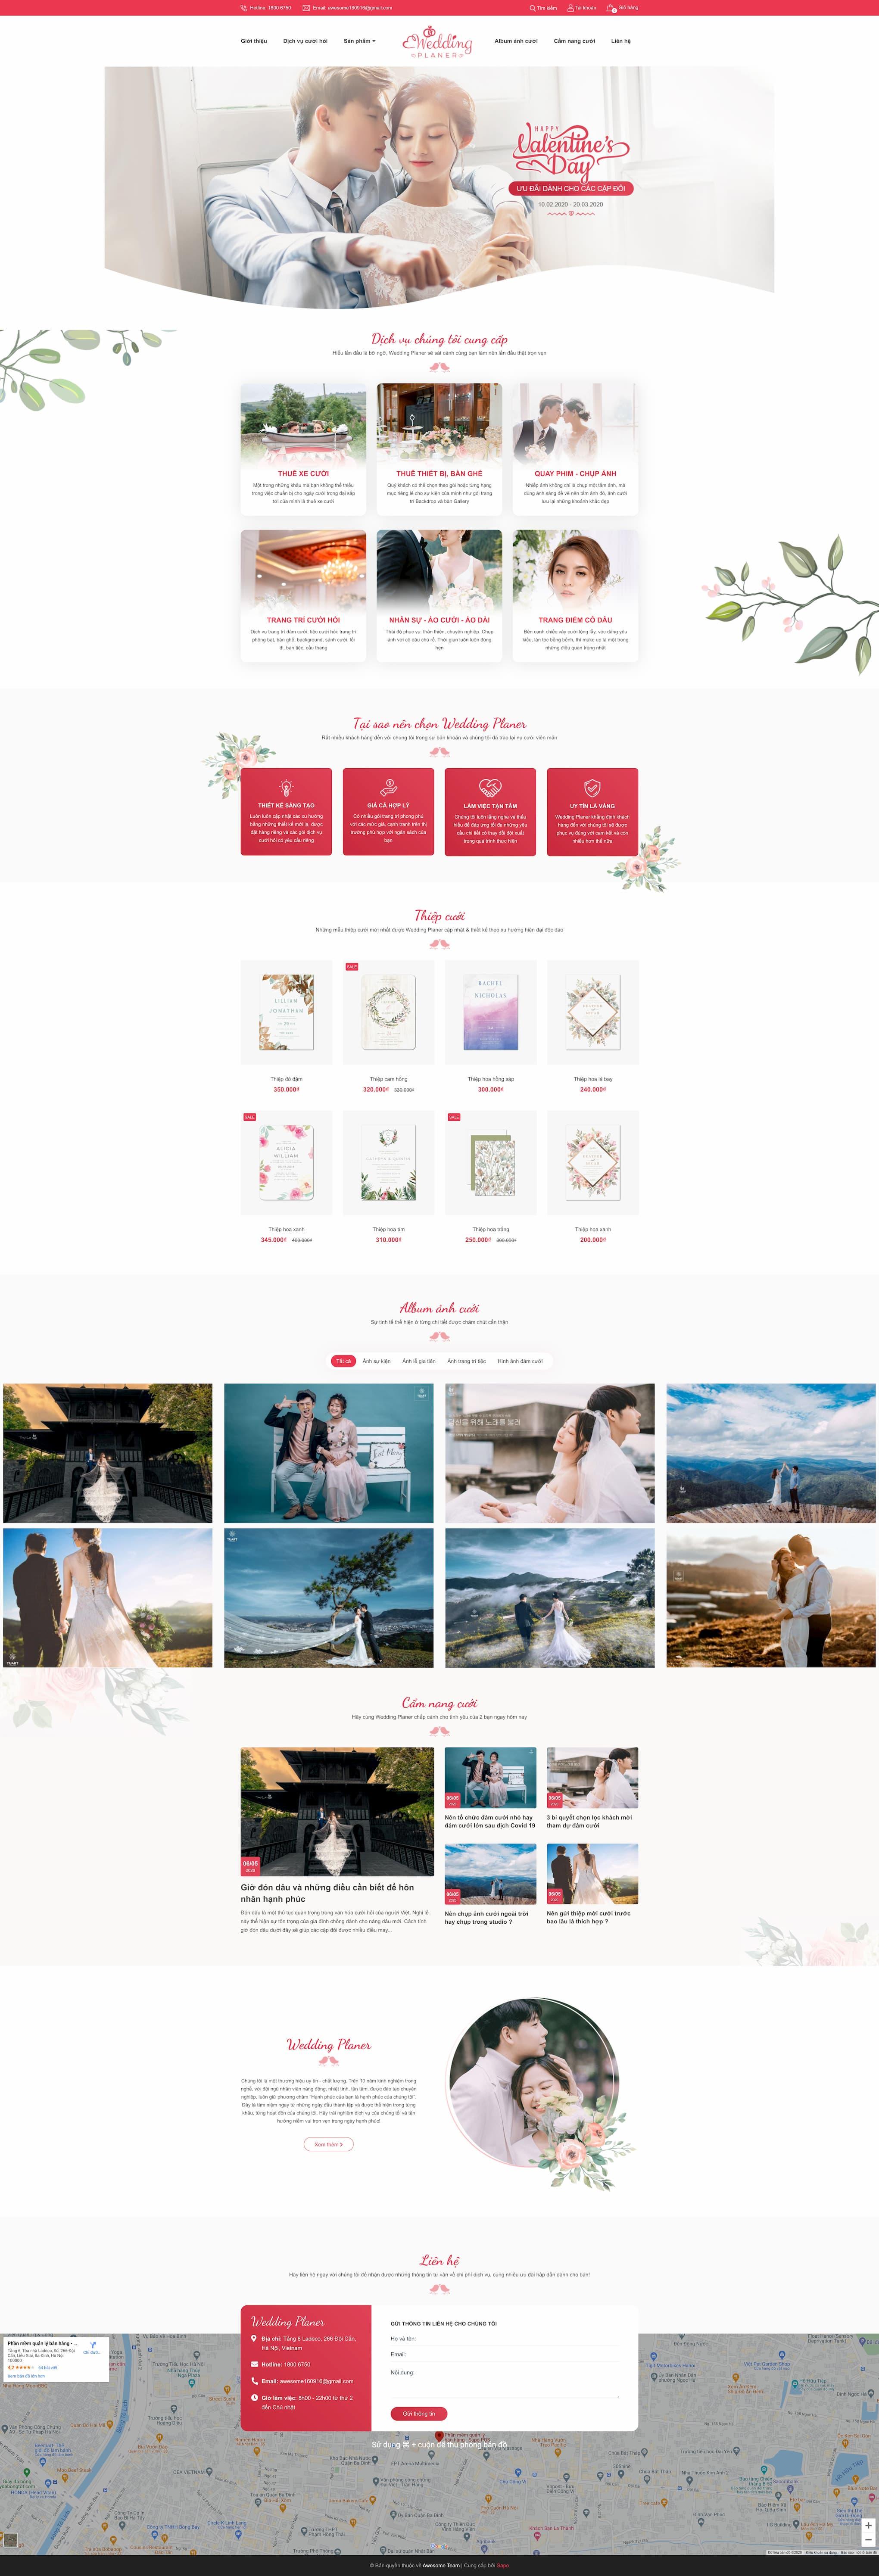 xcod-template-wedding-planner (1)